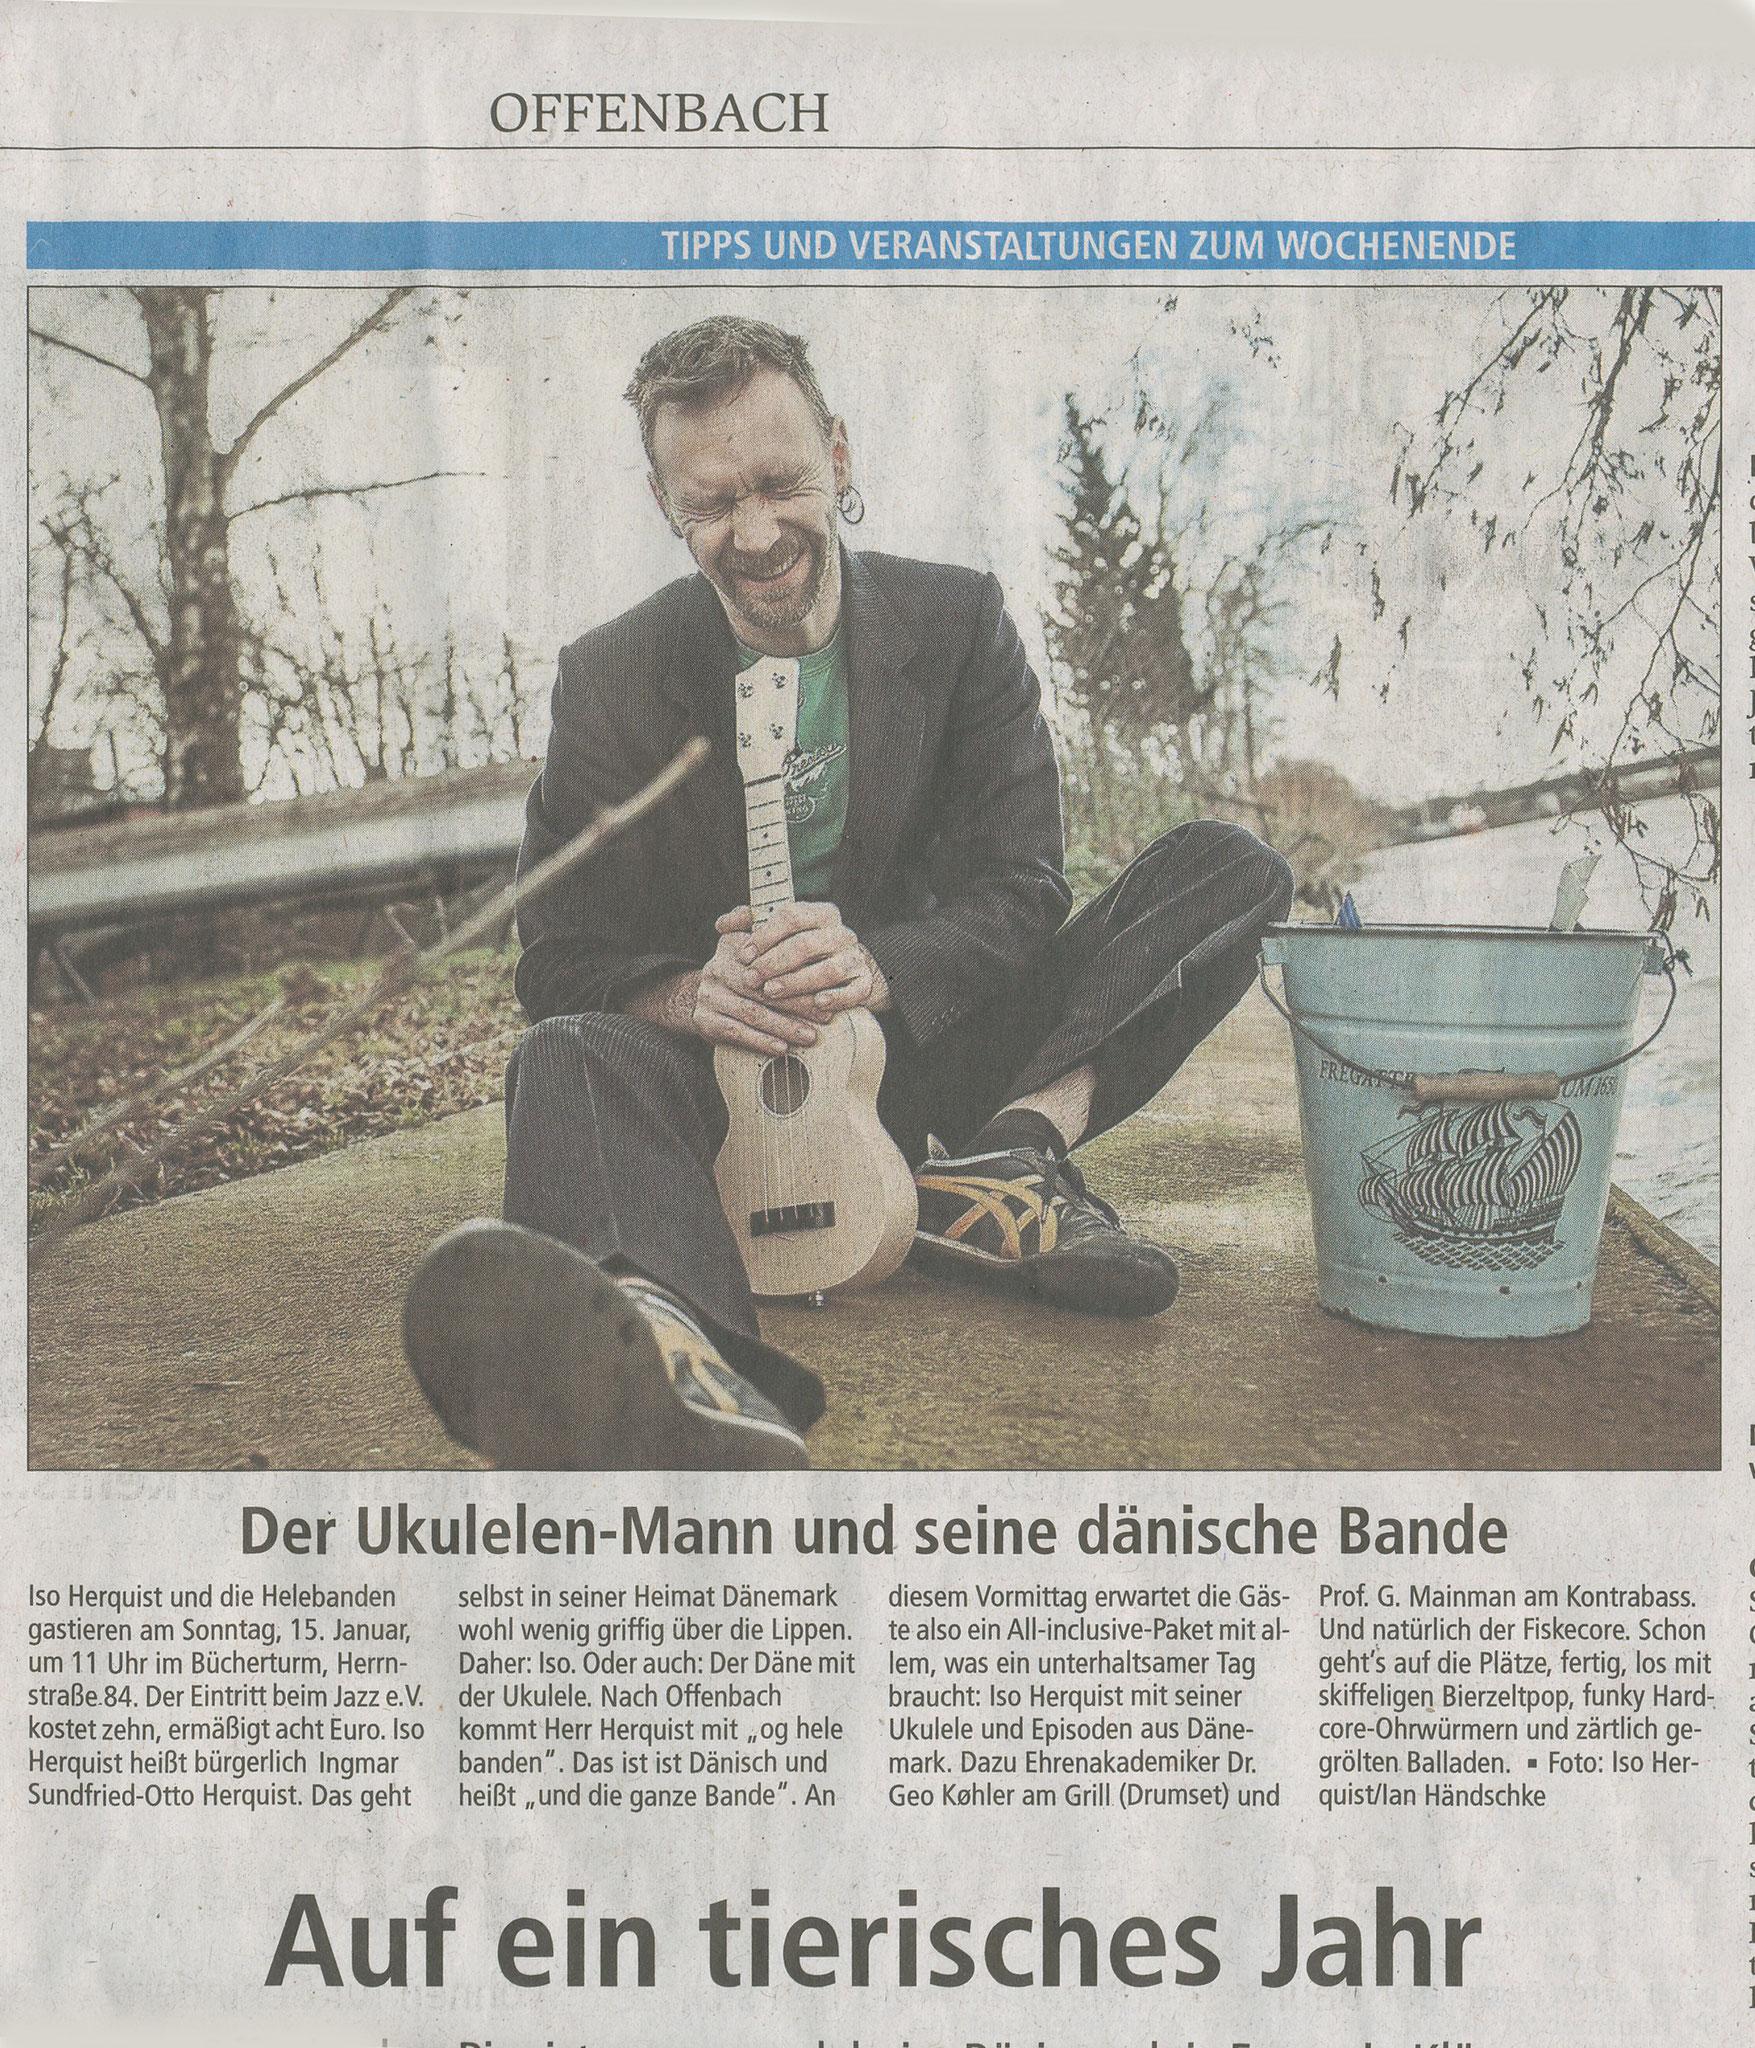 Offenbach Post, 13. Januar 2017